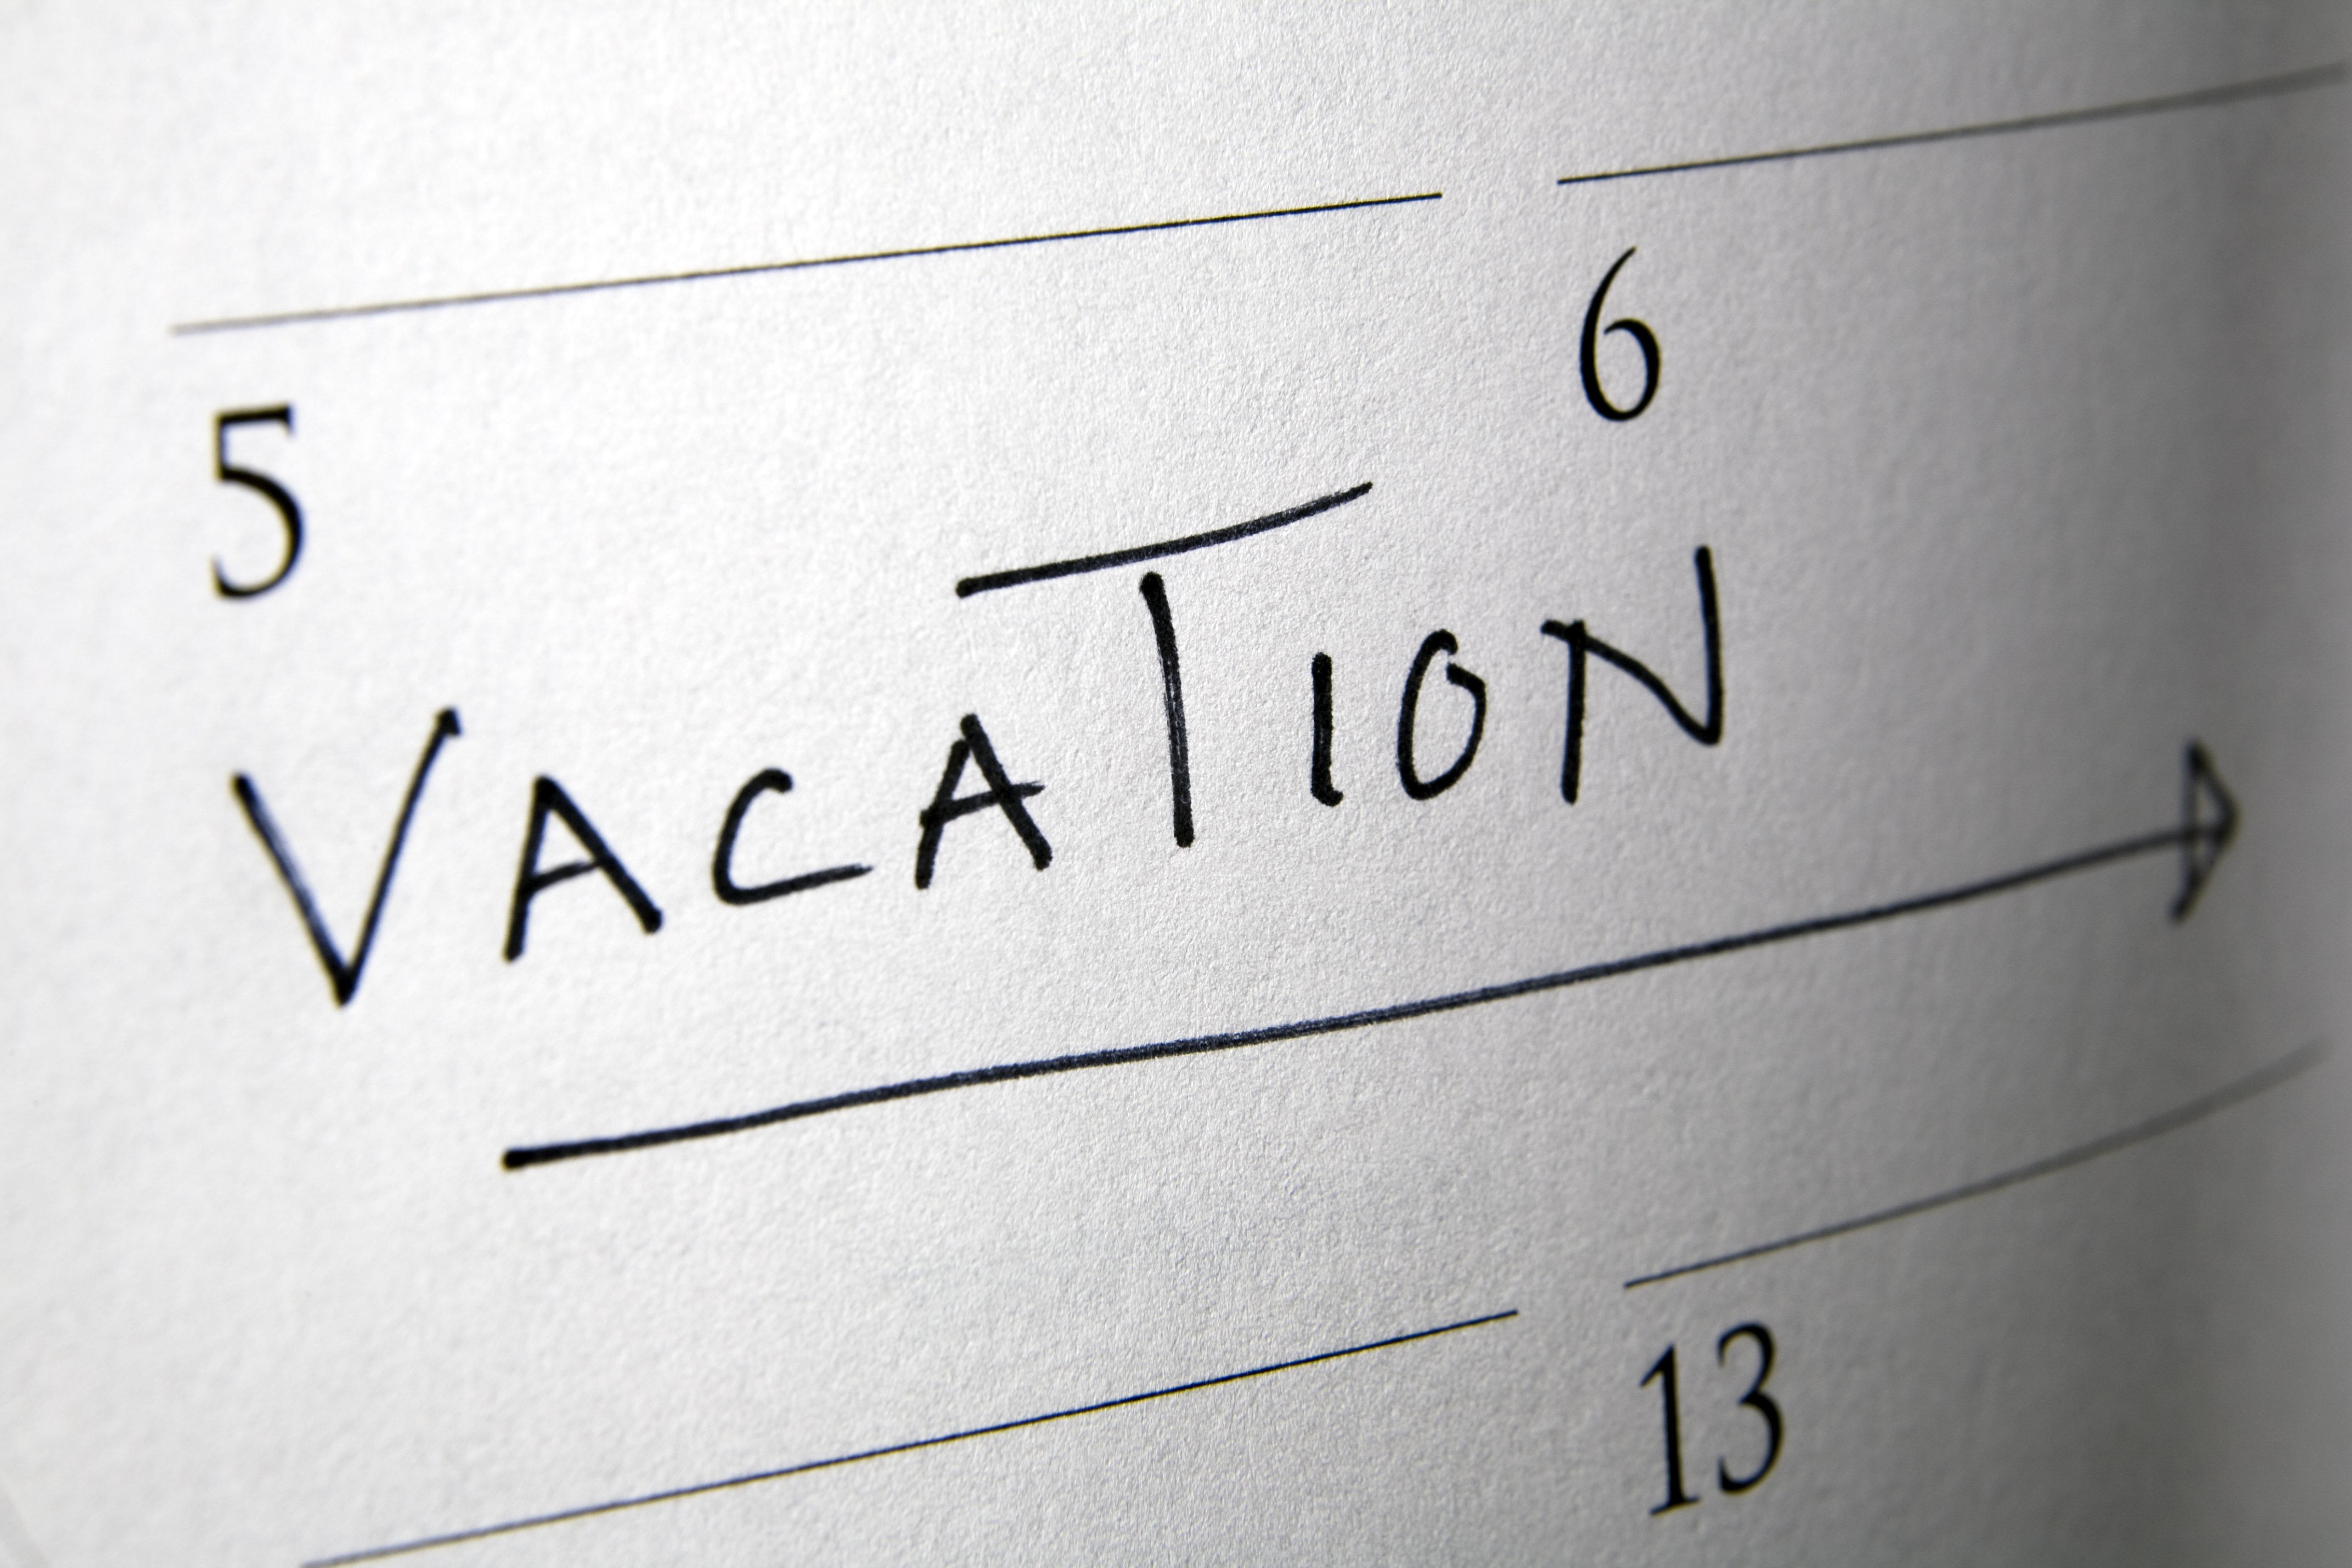 Notation in calendar.